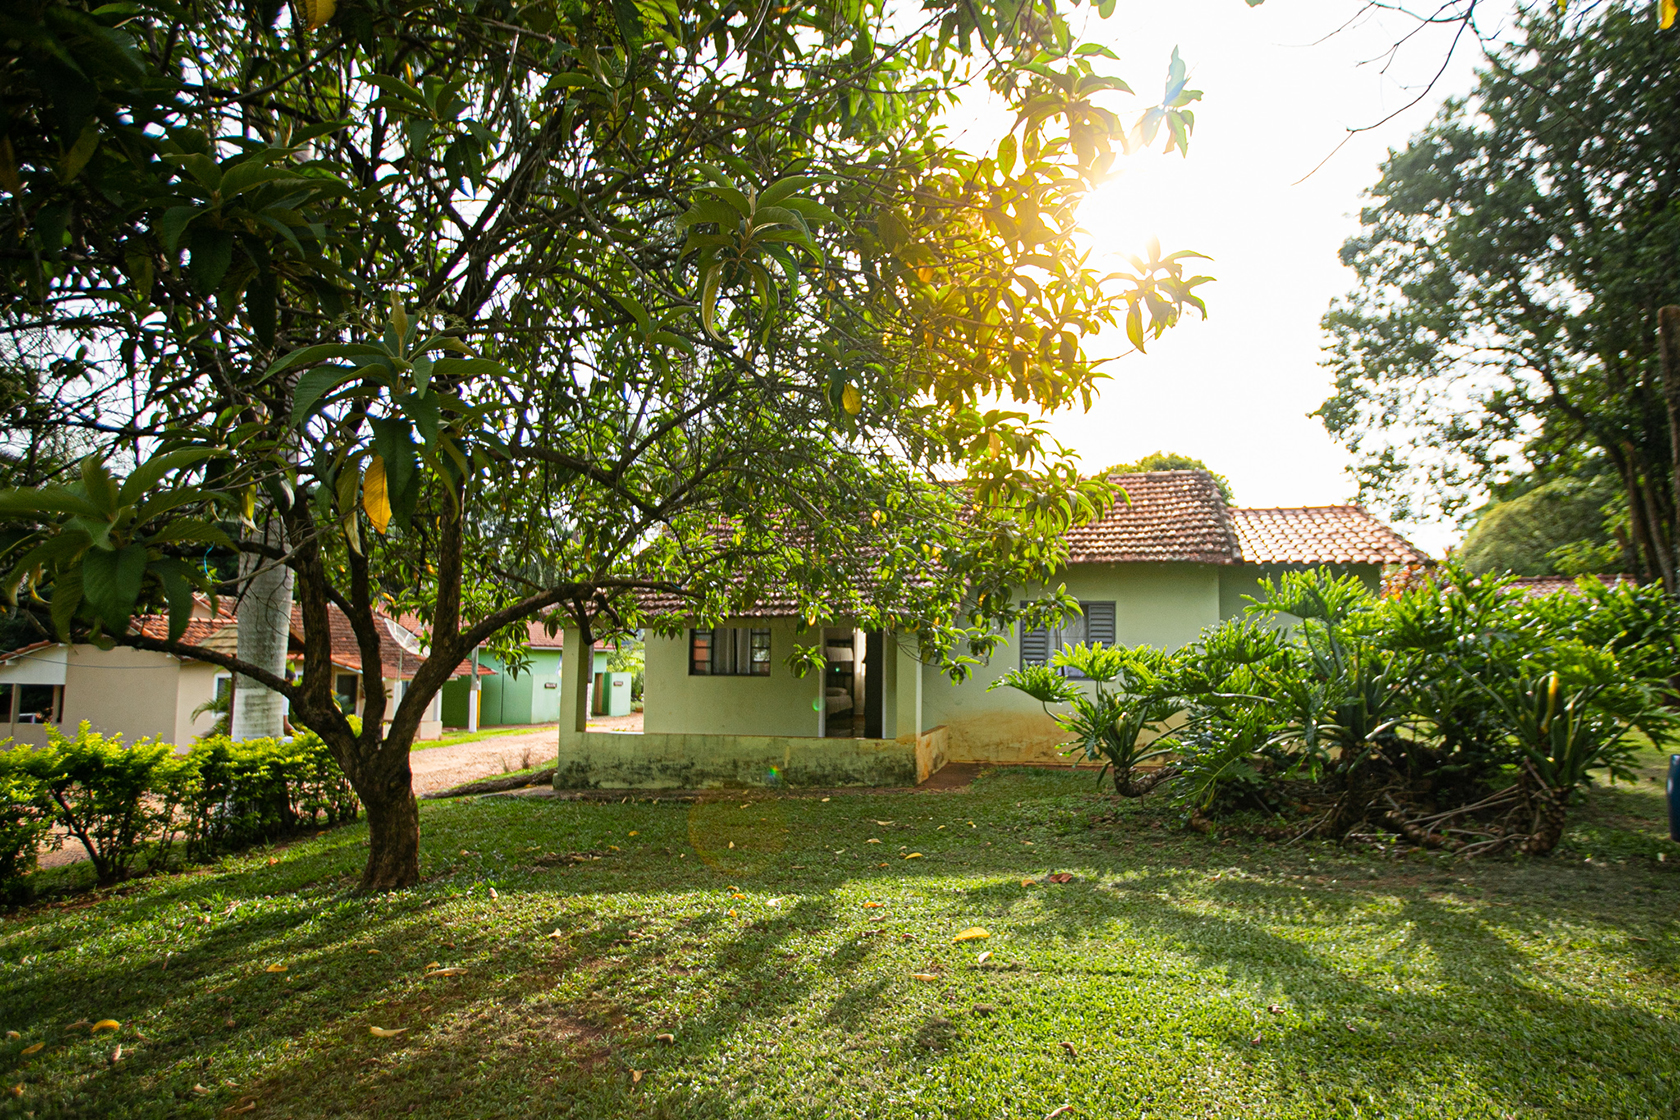 Vila Jacaré Casa